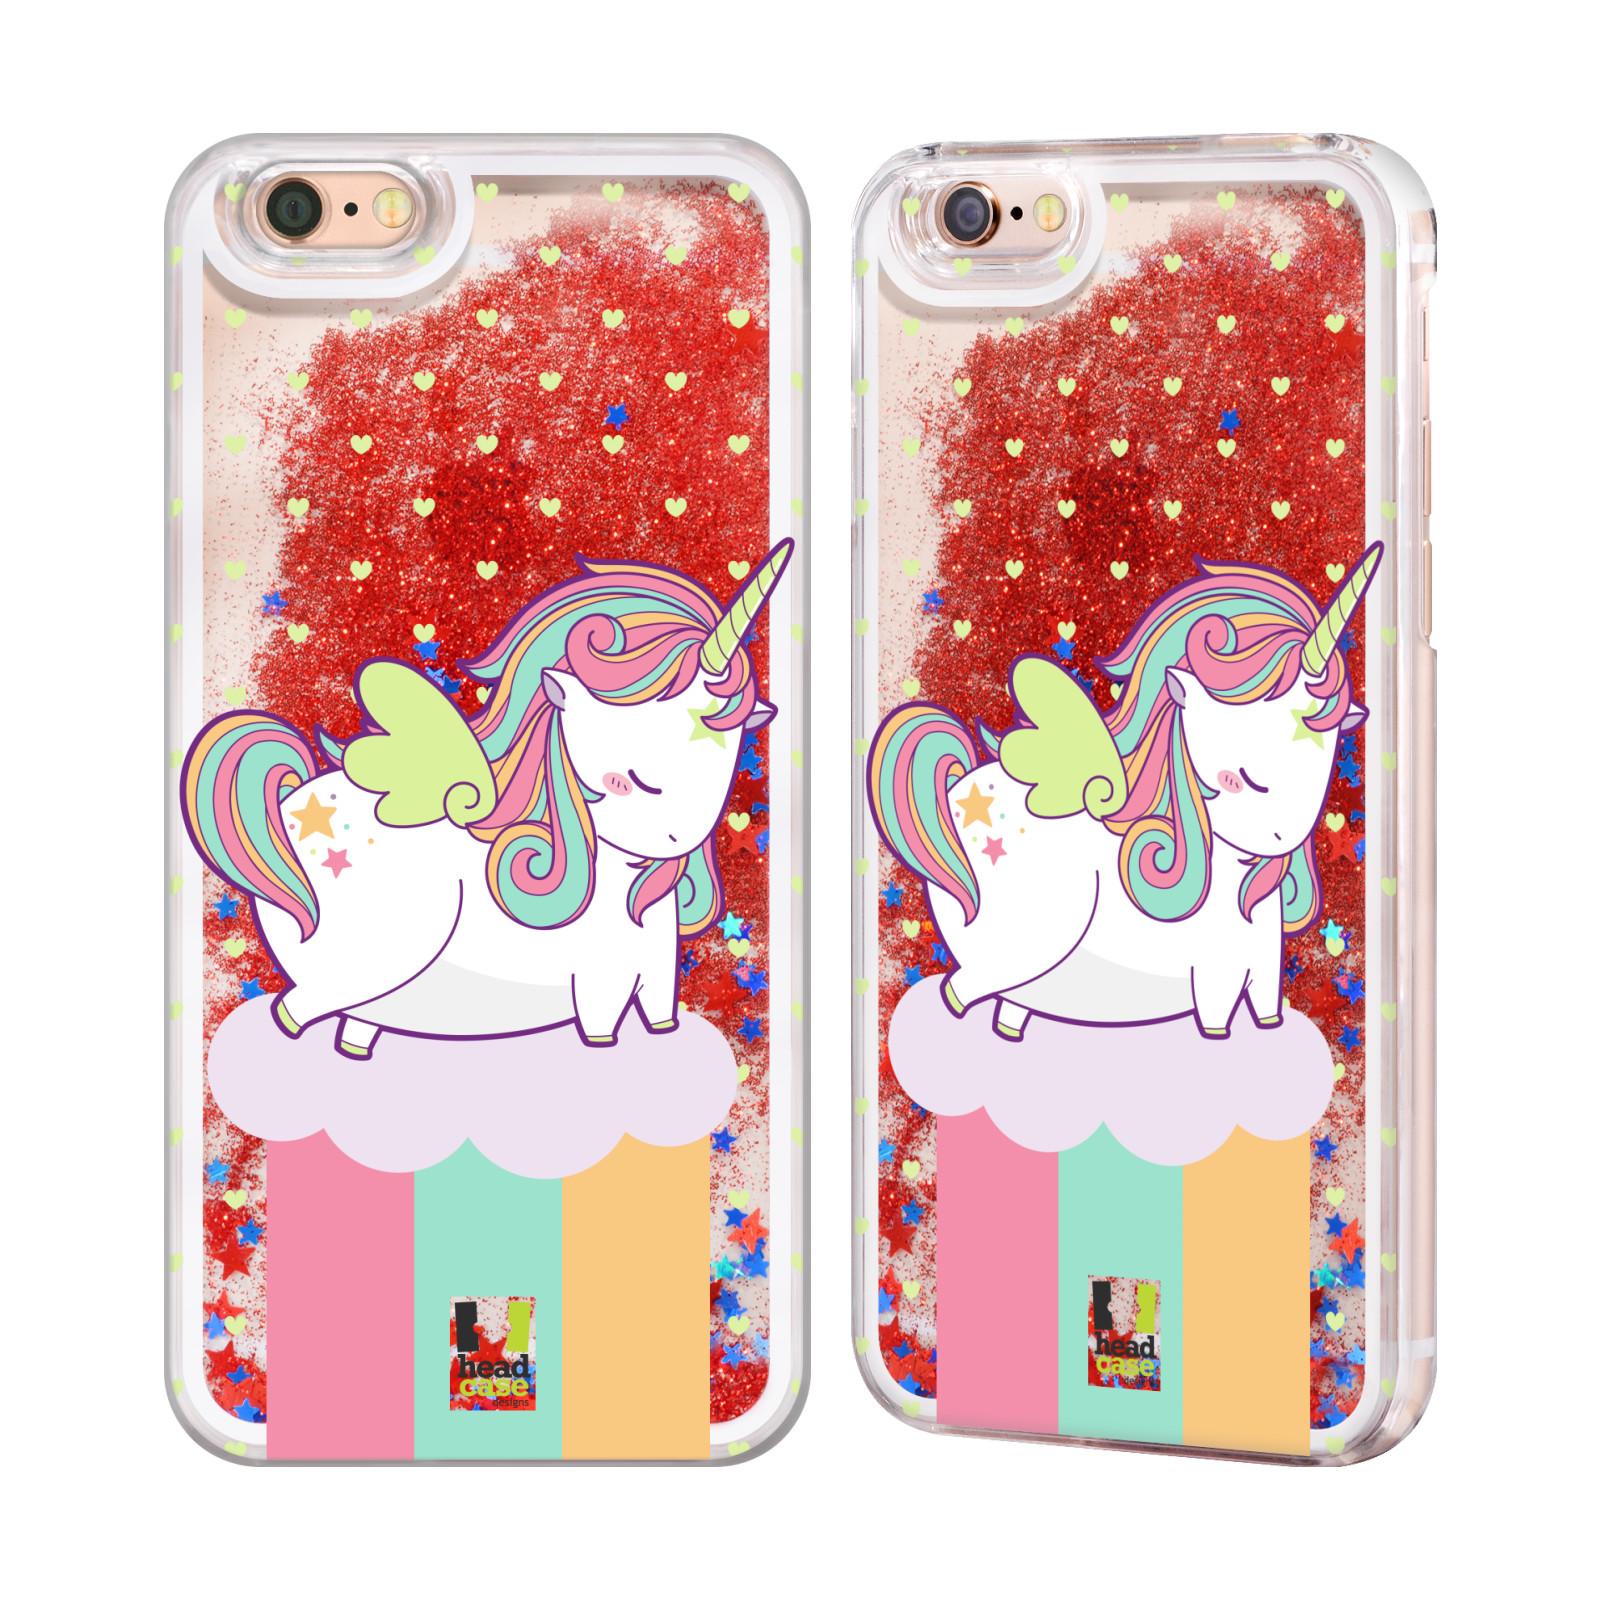 HEAD CASE UNICORN CHUBBY RED LIQUID GLITTER CASE FOR APPLE iPHONE SAMSUNG PHONES | eBay